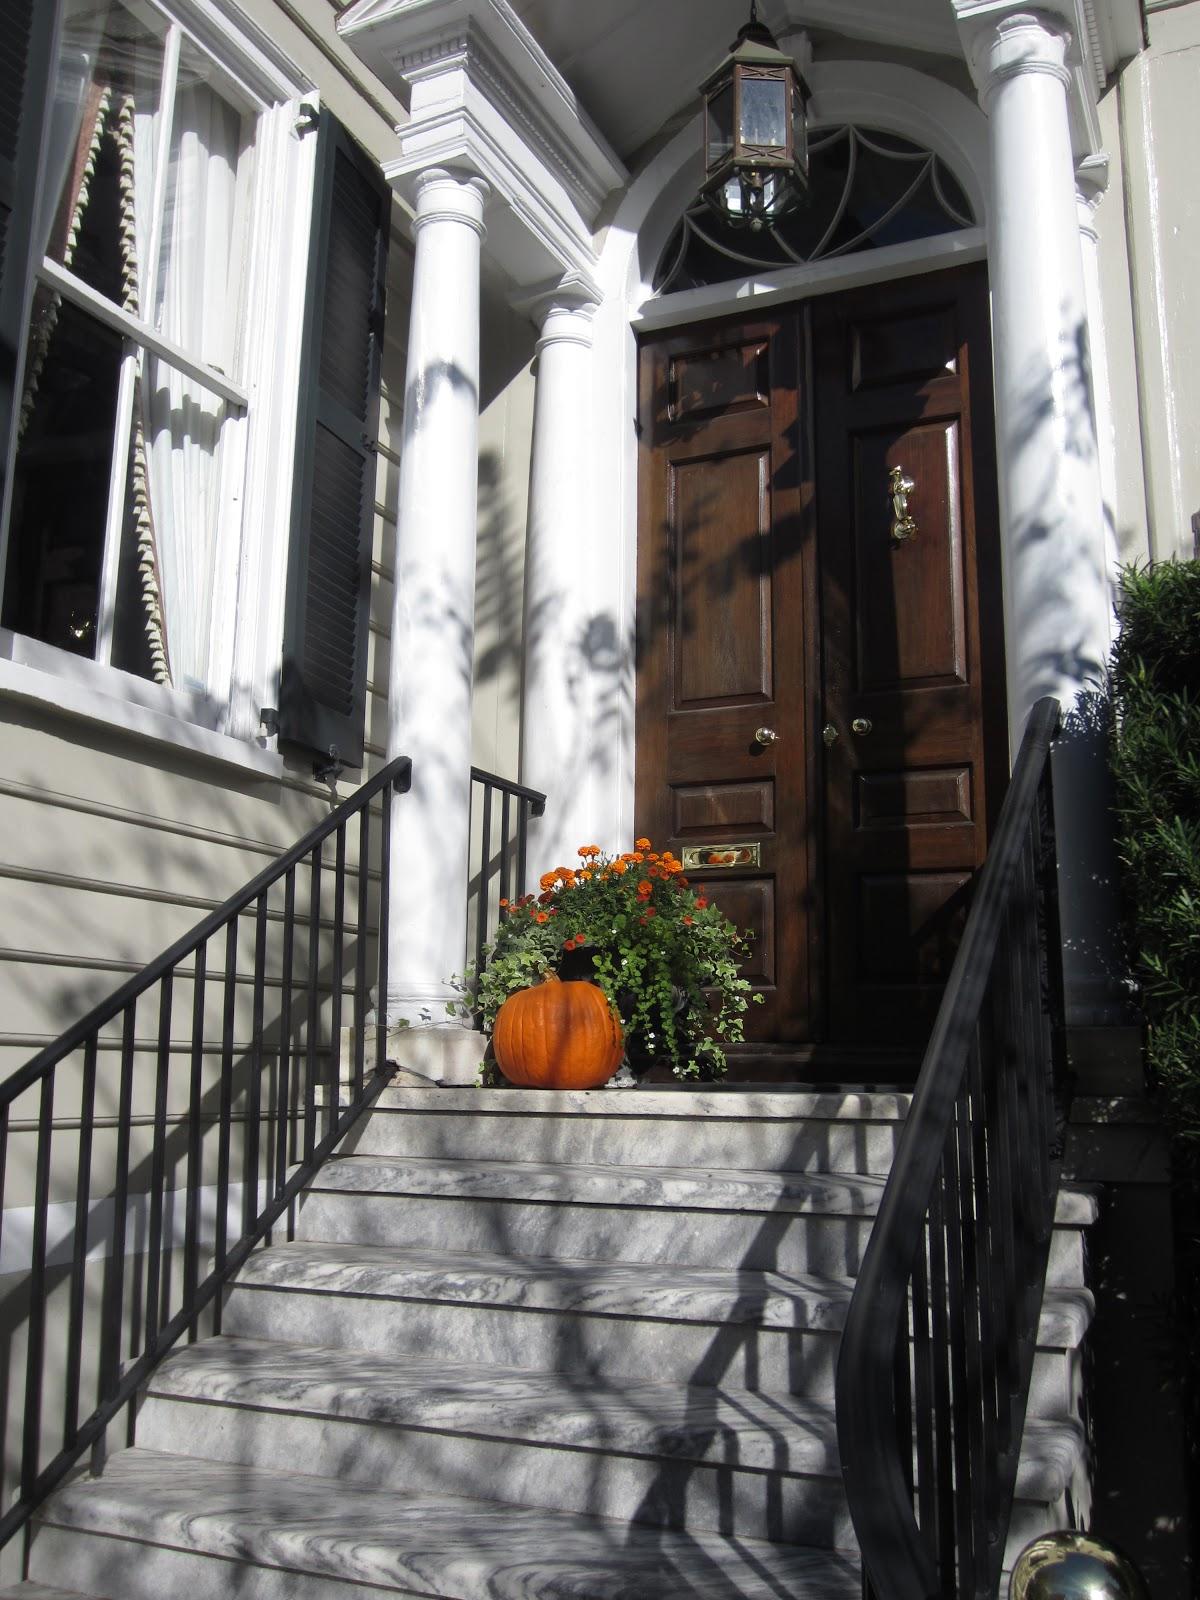 Simple Fall Porch with Orange Pumpkin